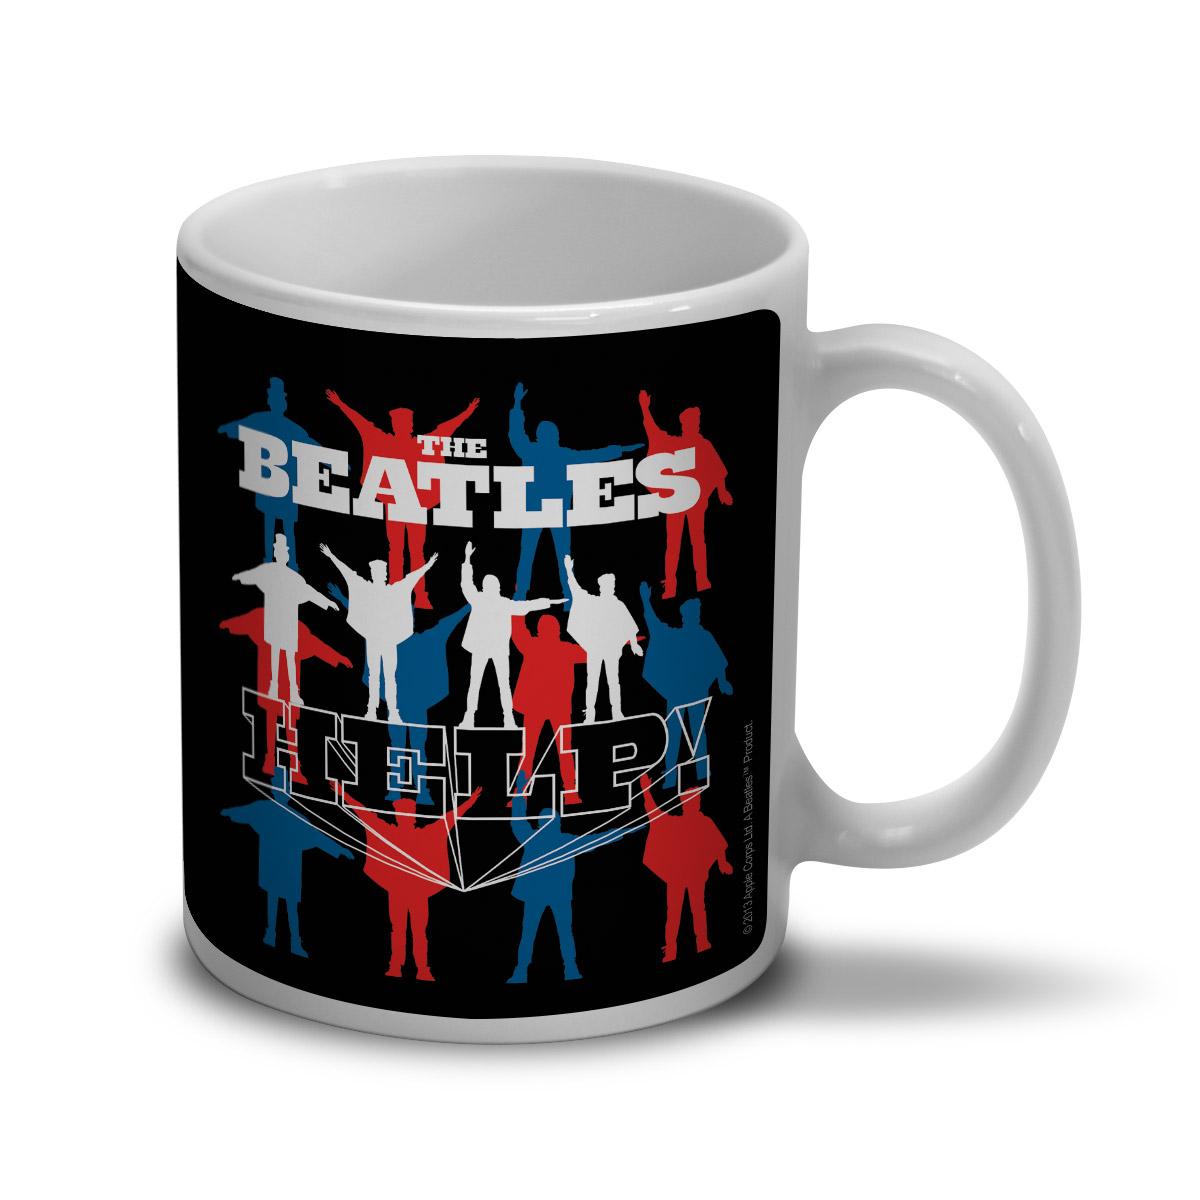 Caneca The Beatles Help